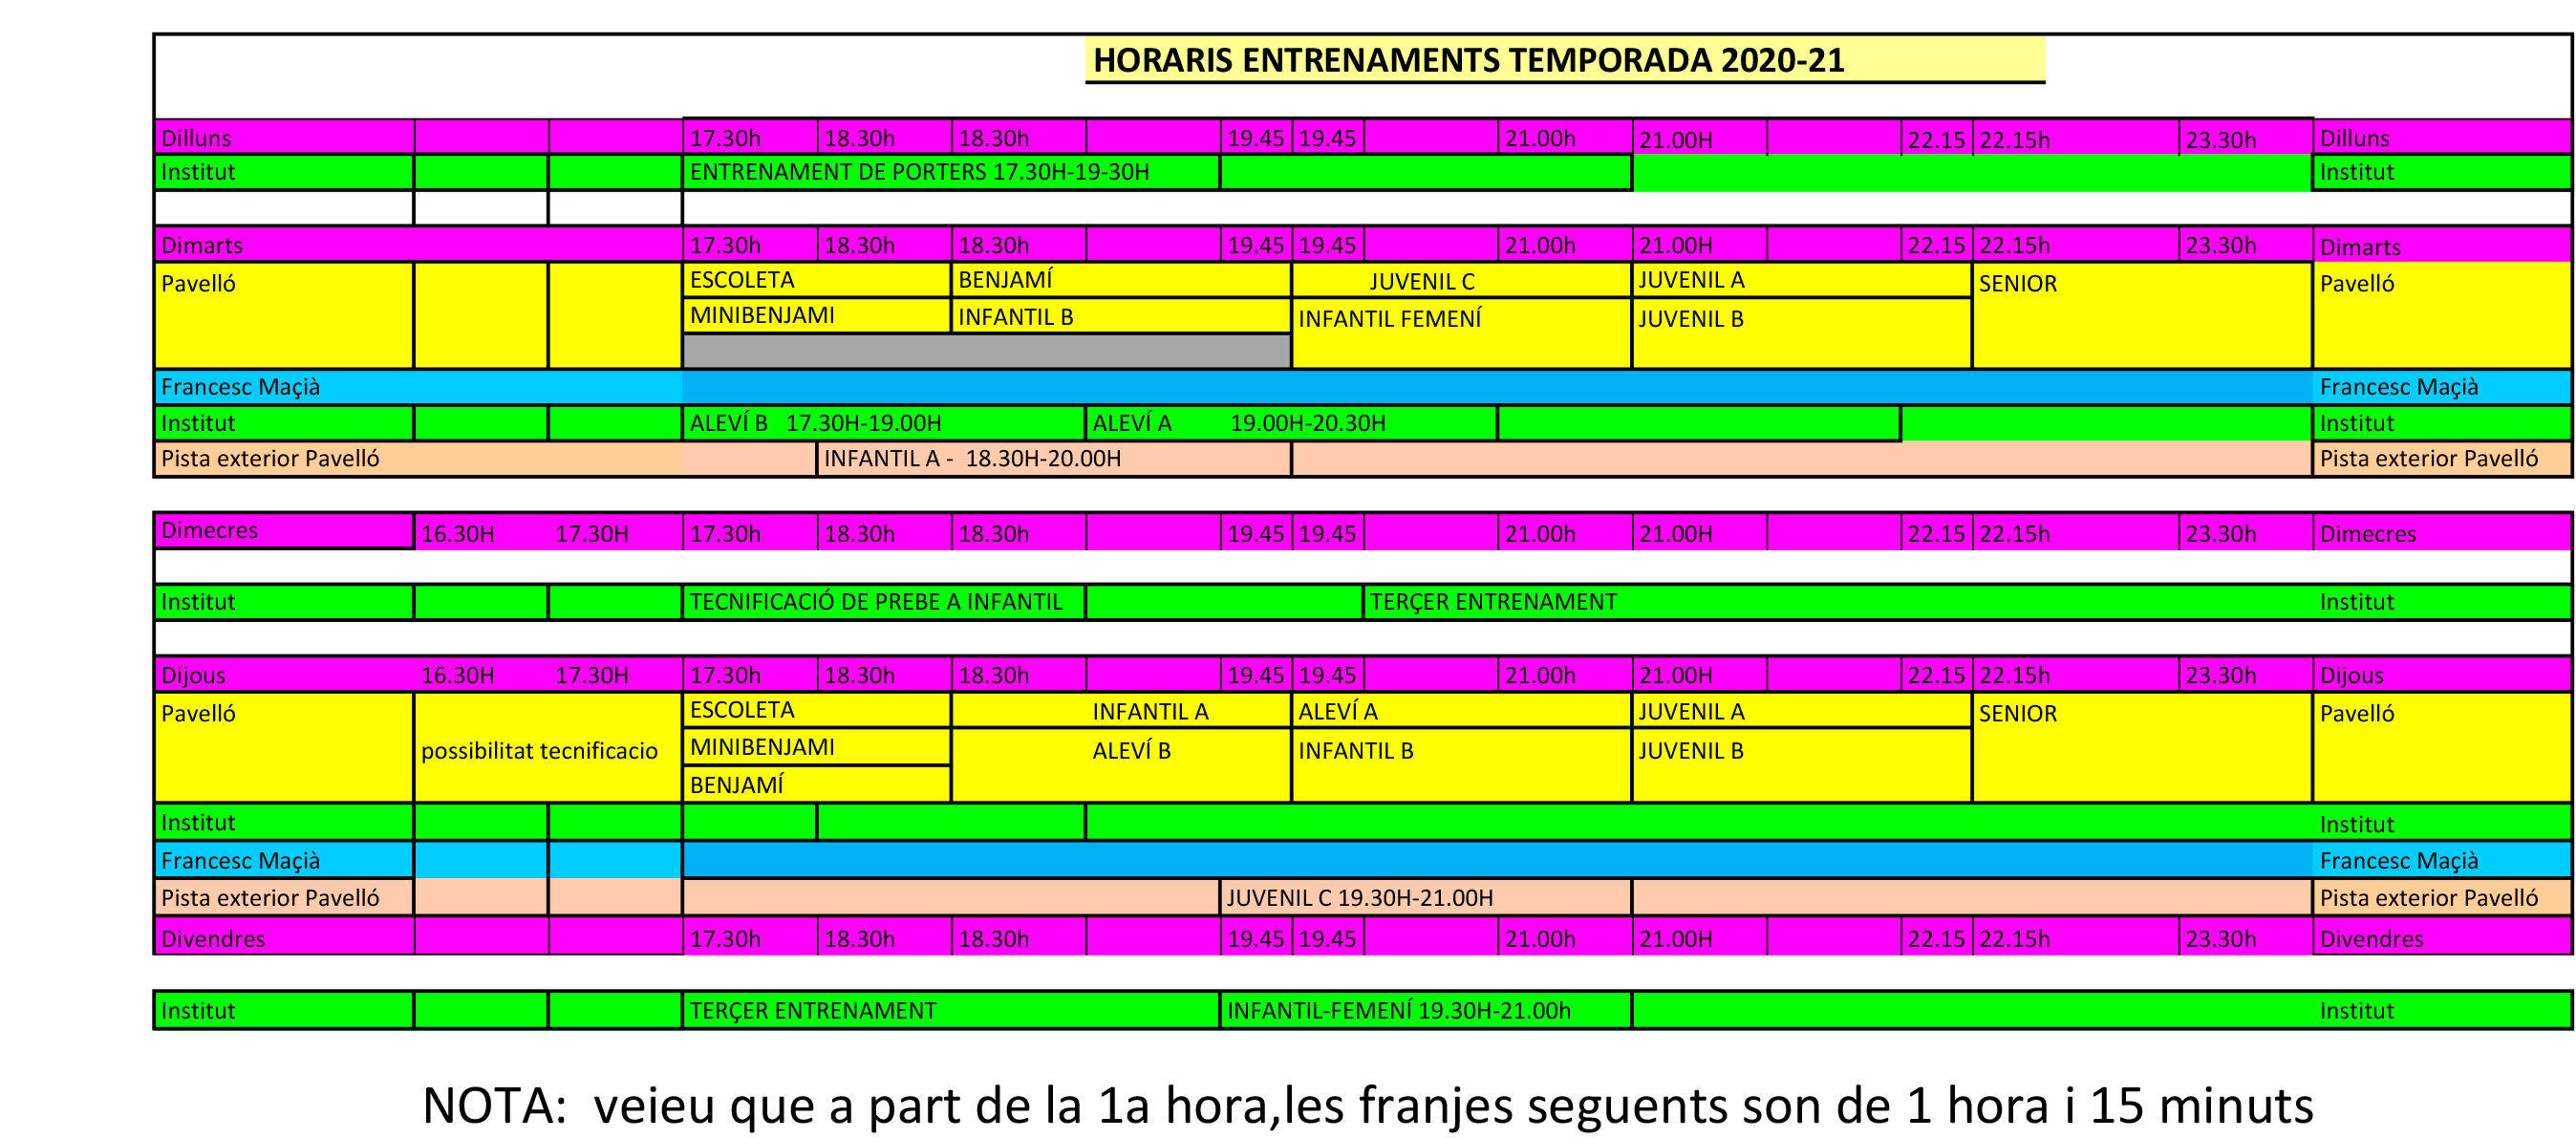 HORARIS ENTRENO 2020-21 150920 - HORARIS 2020-21